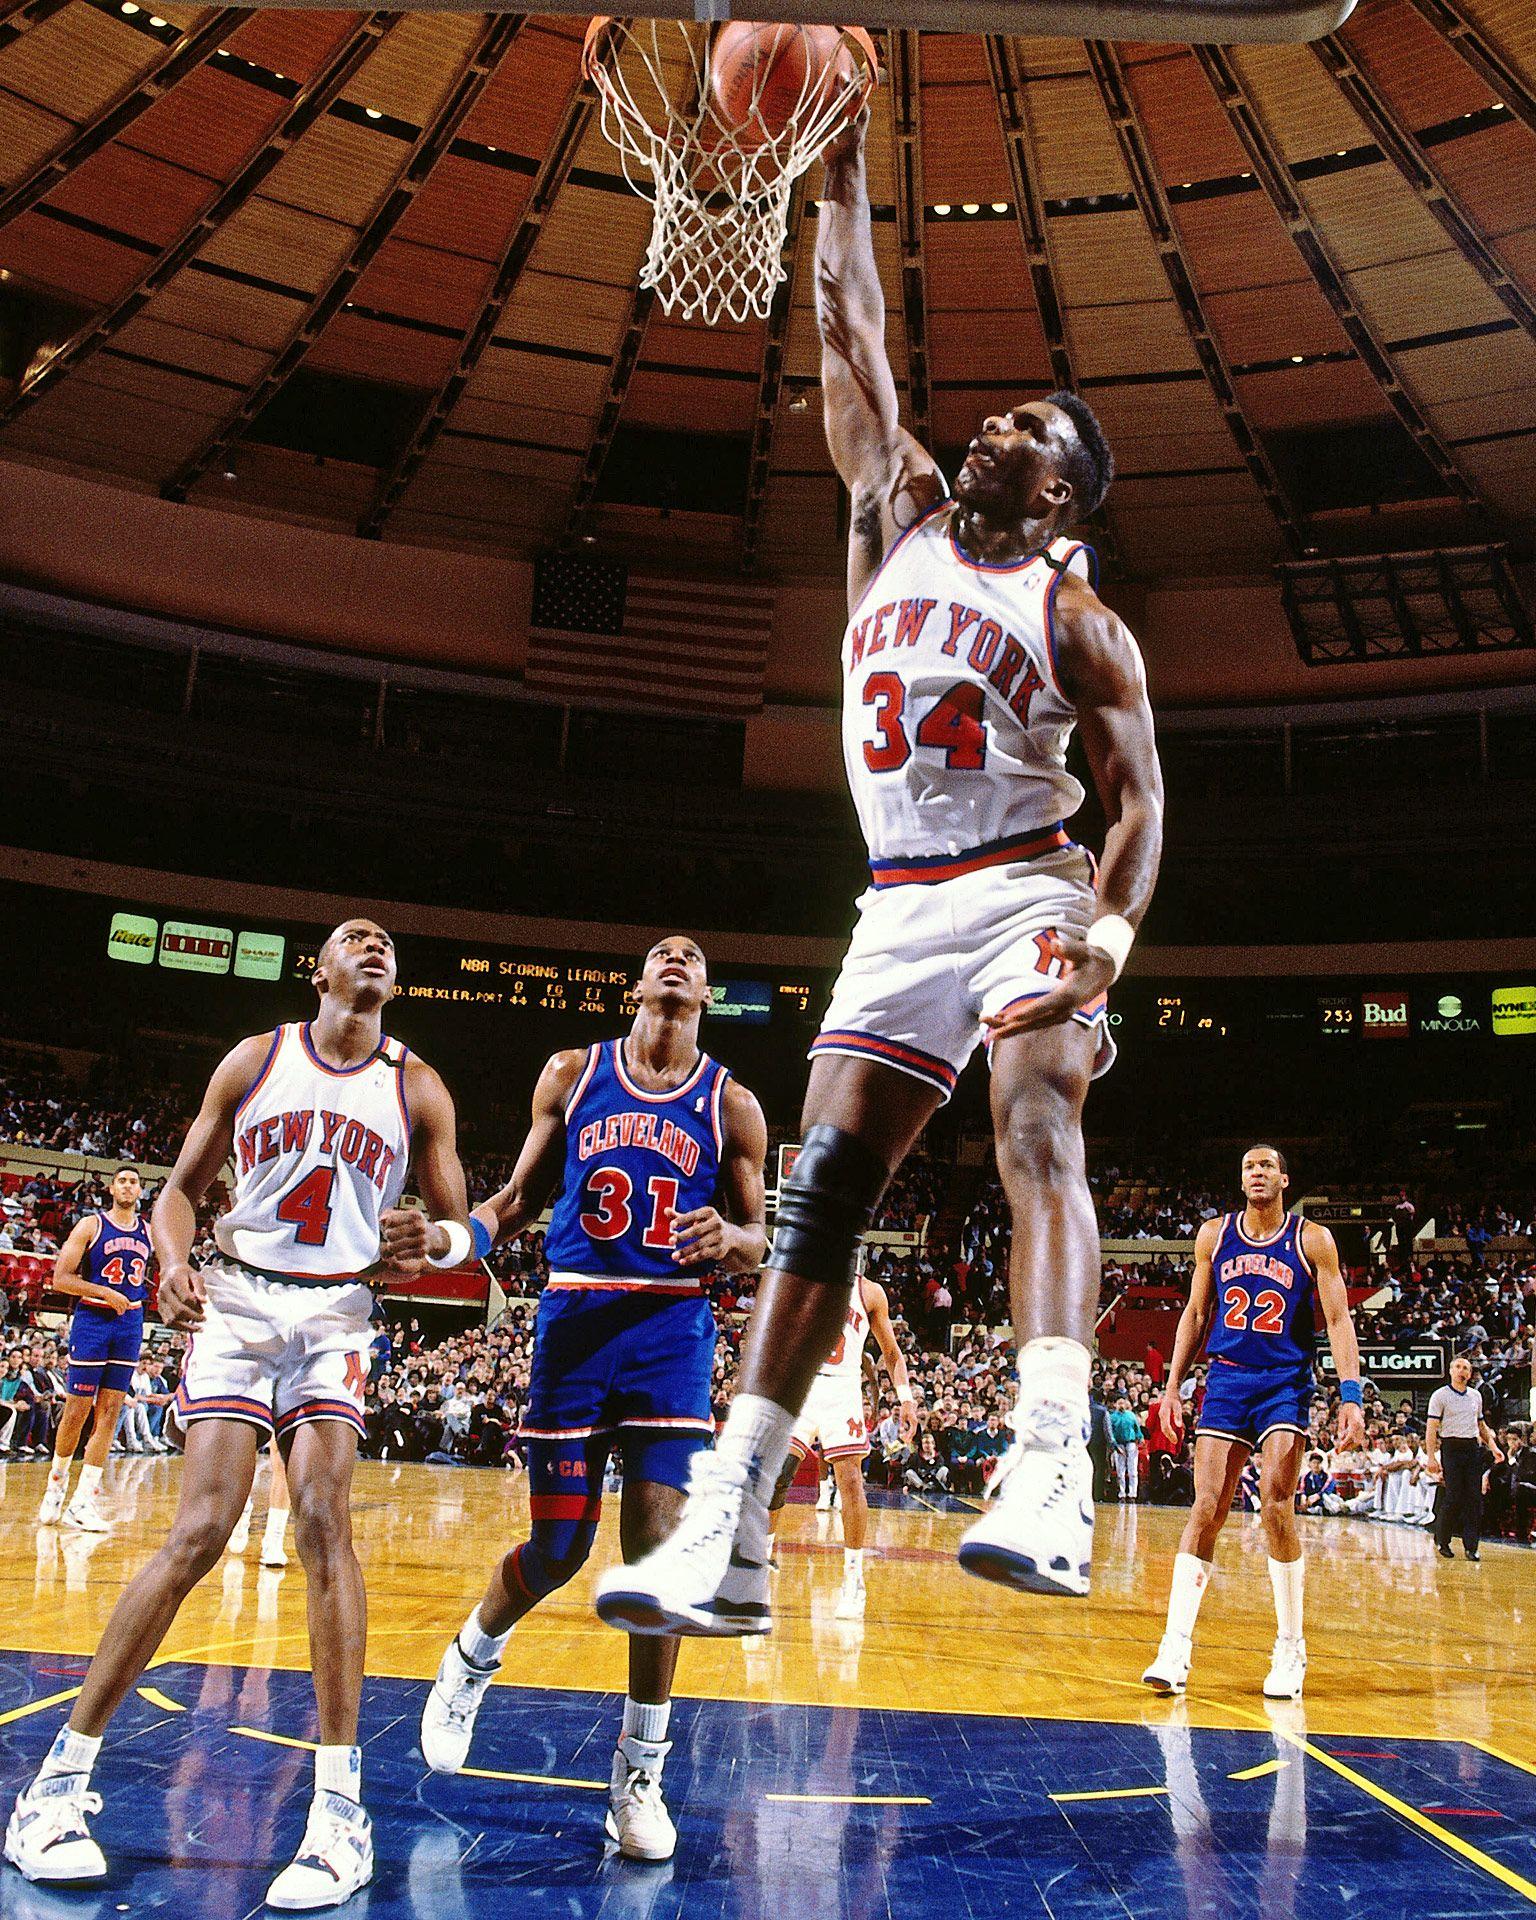 Nba Basketball New York Knicks: New York Knicks, Nba